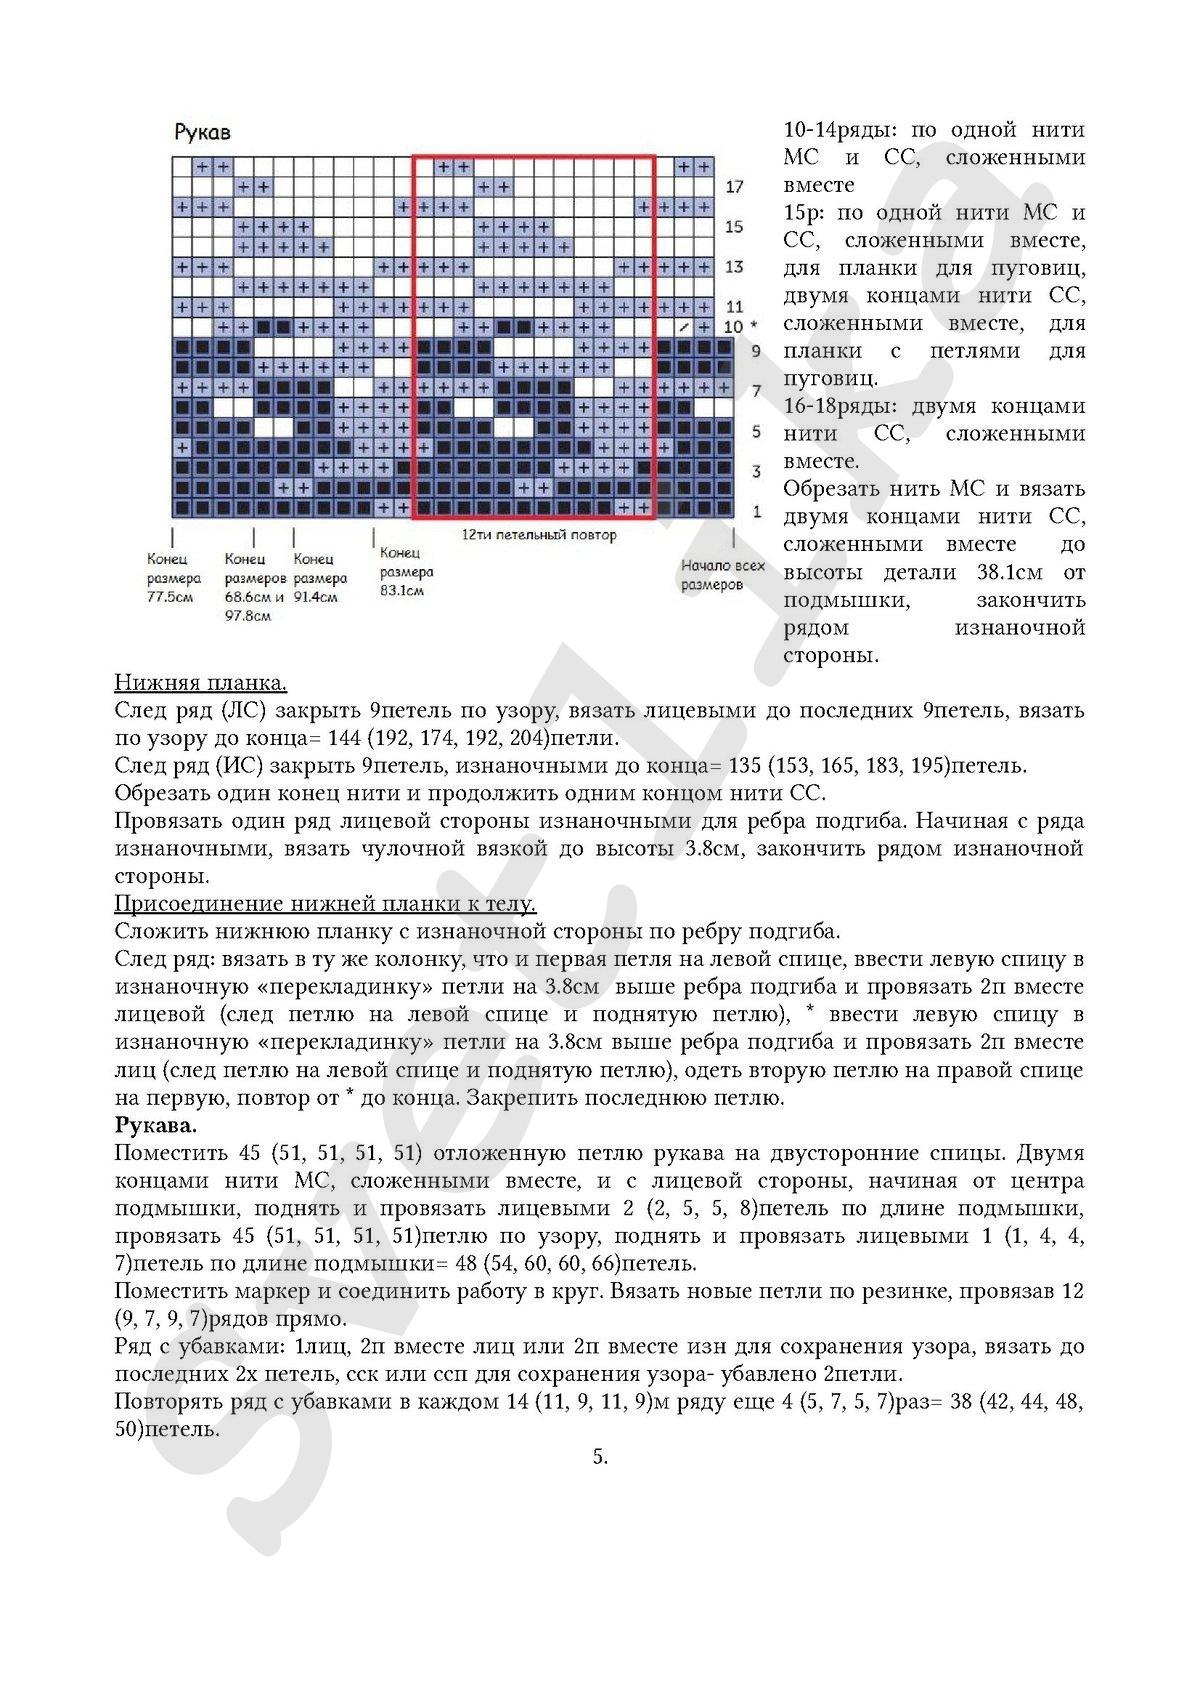 https://img-fotki.yandex.ru/get/872977/125862467.117/0_1d3e6b_662a6a93_orig